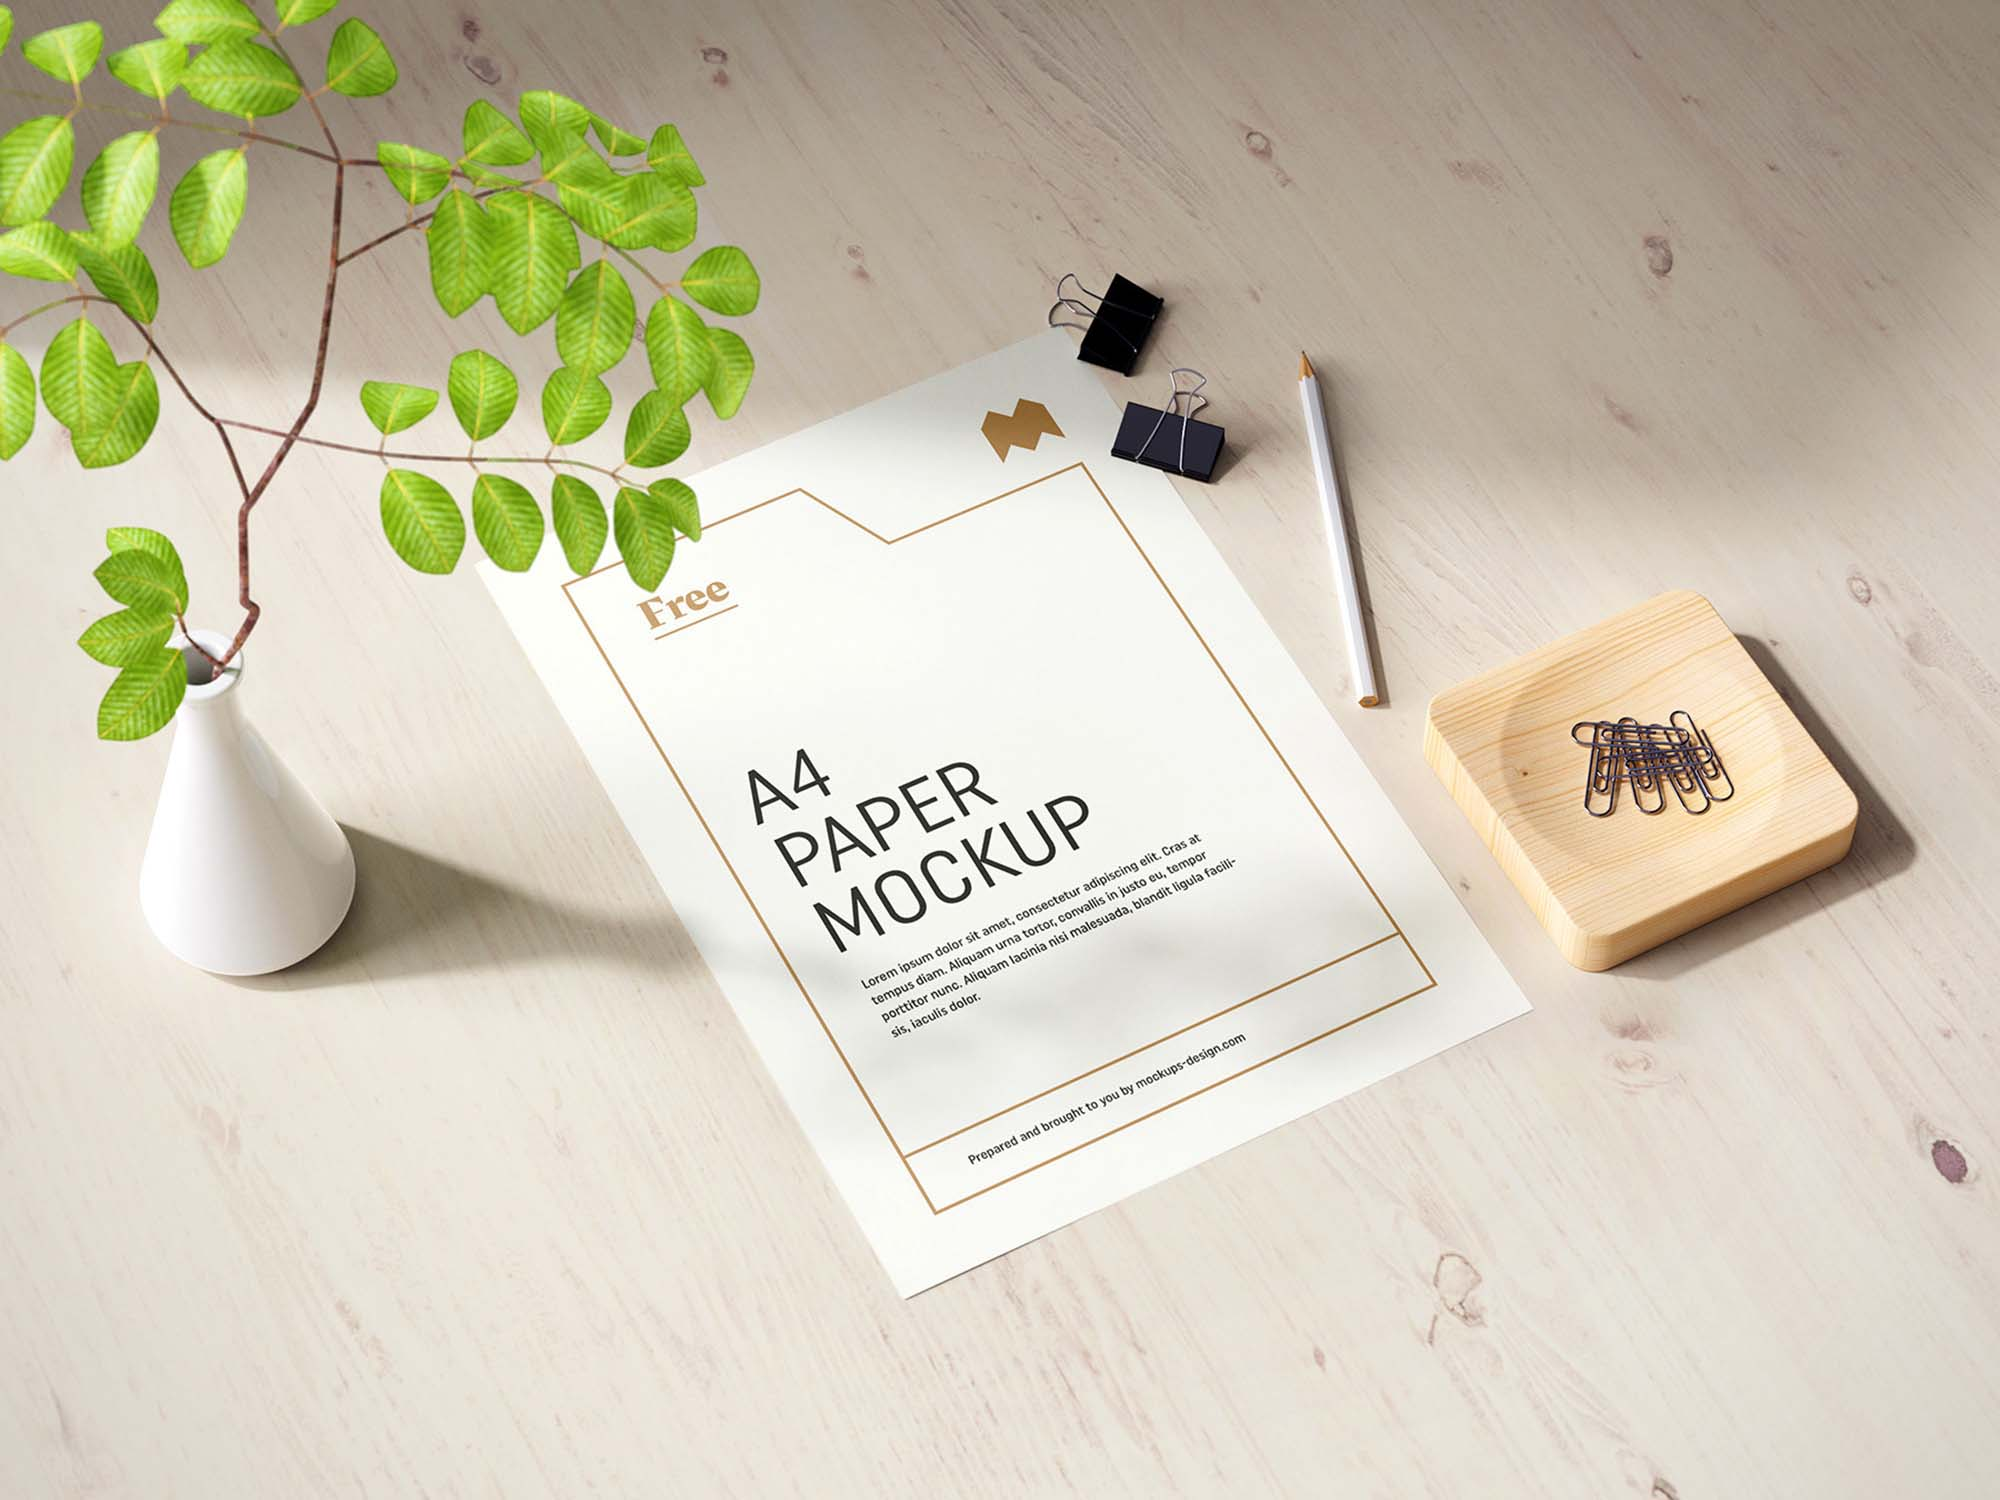 A4 Paper Mockup 1